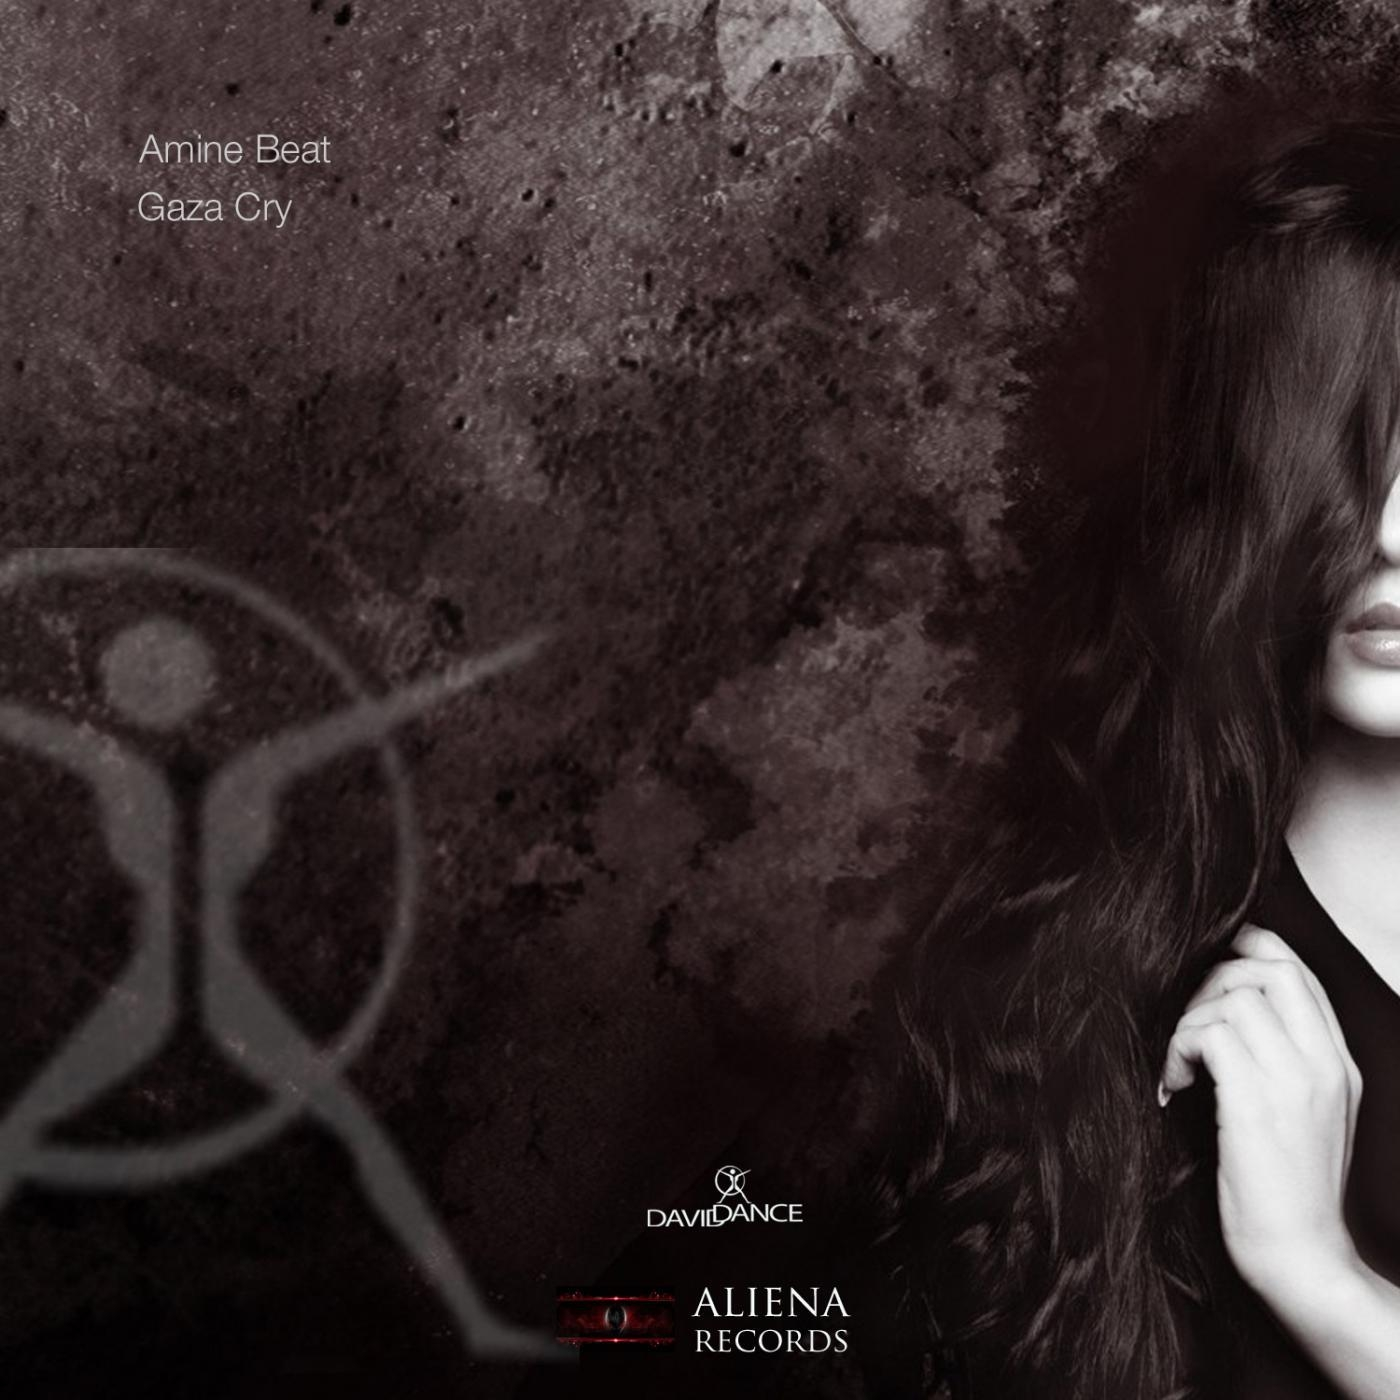 Amine Beat - Gaza Cry (Extended Mix)